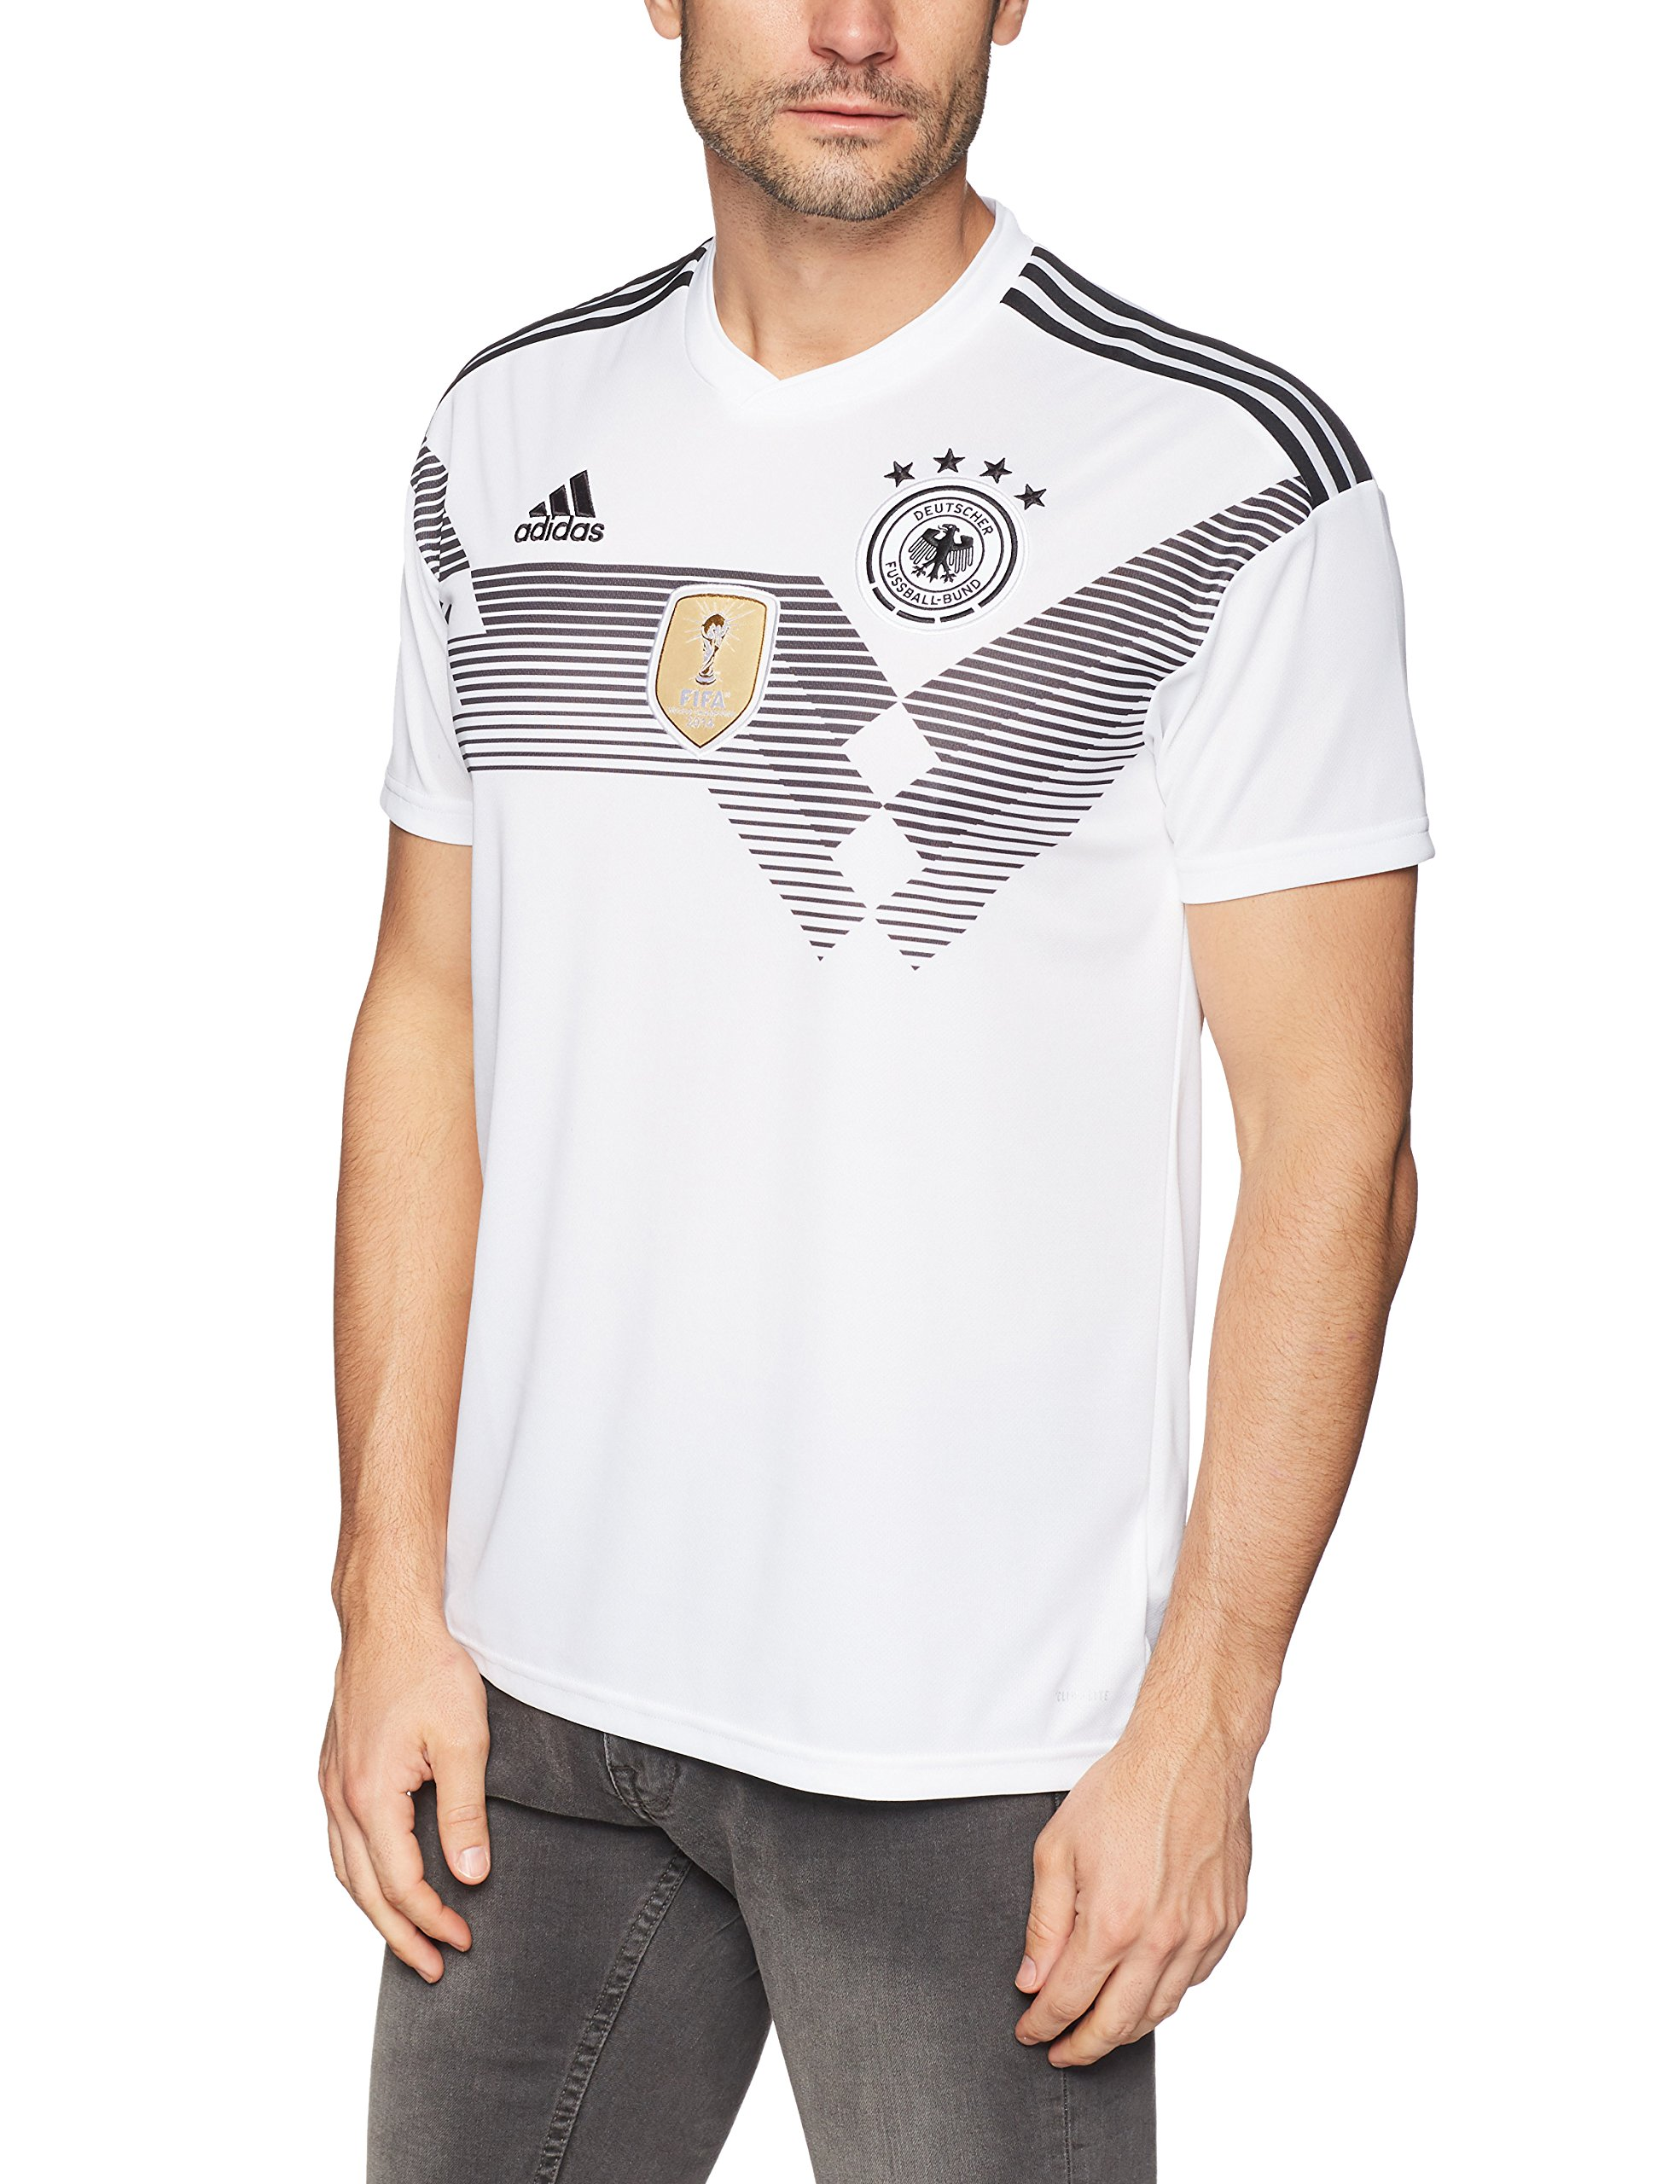 Mejor valorados en Camisetas de equipación de fútbol para